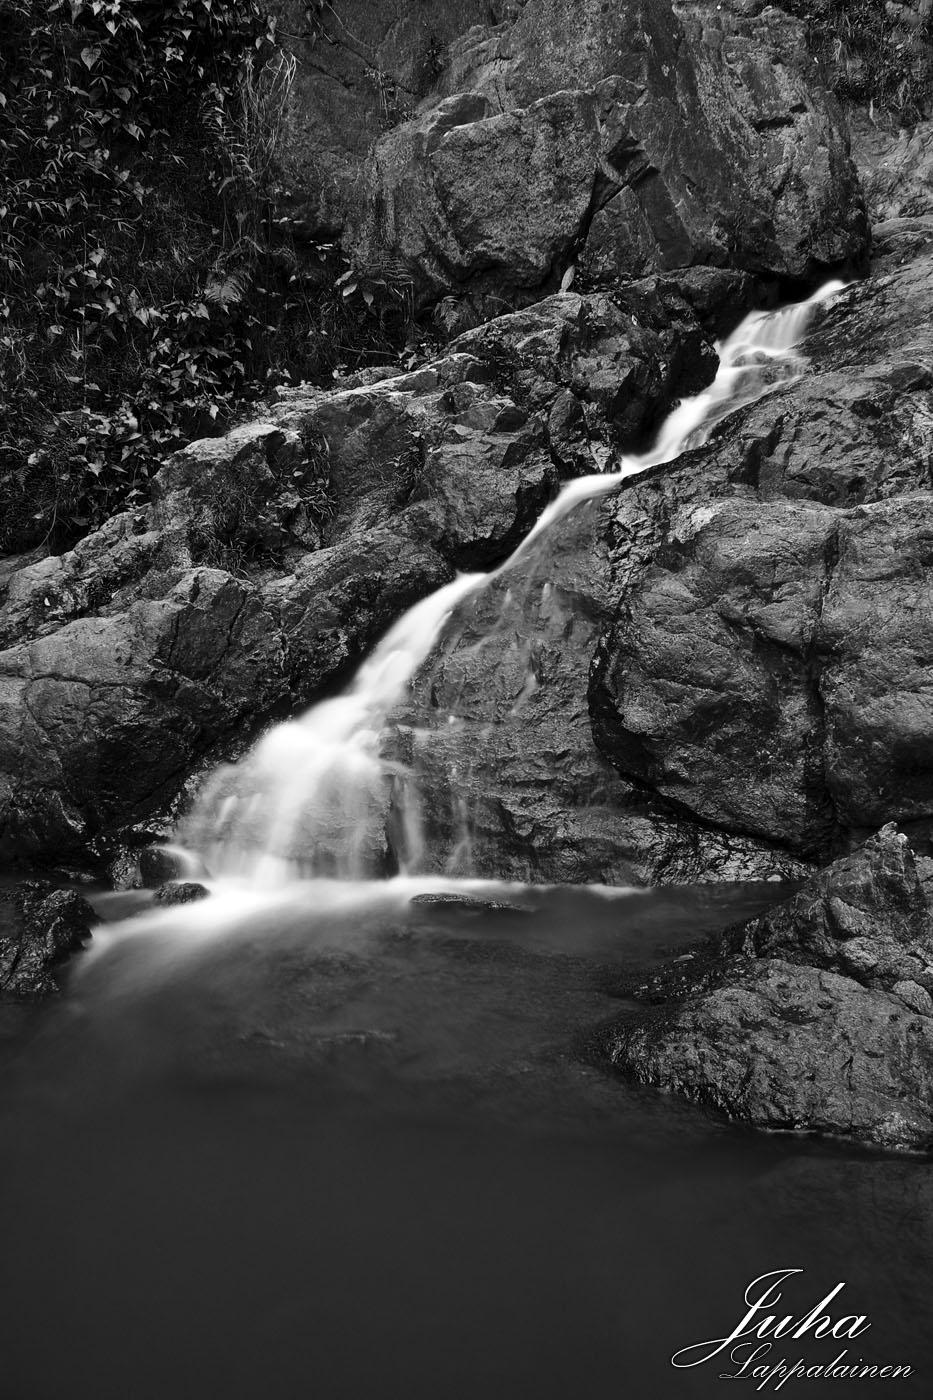 The Namuang Waterfall 2 on Koh Samui